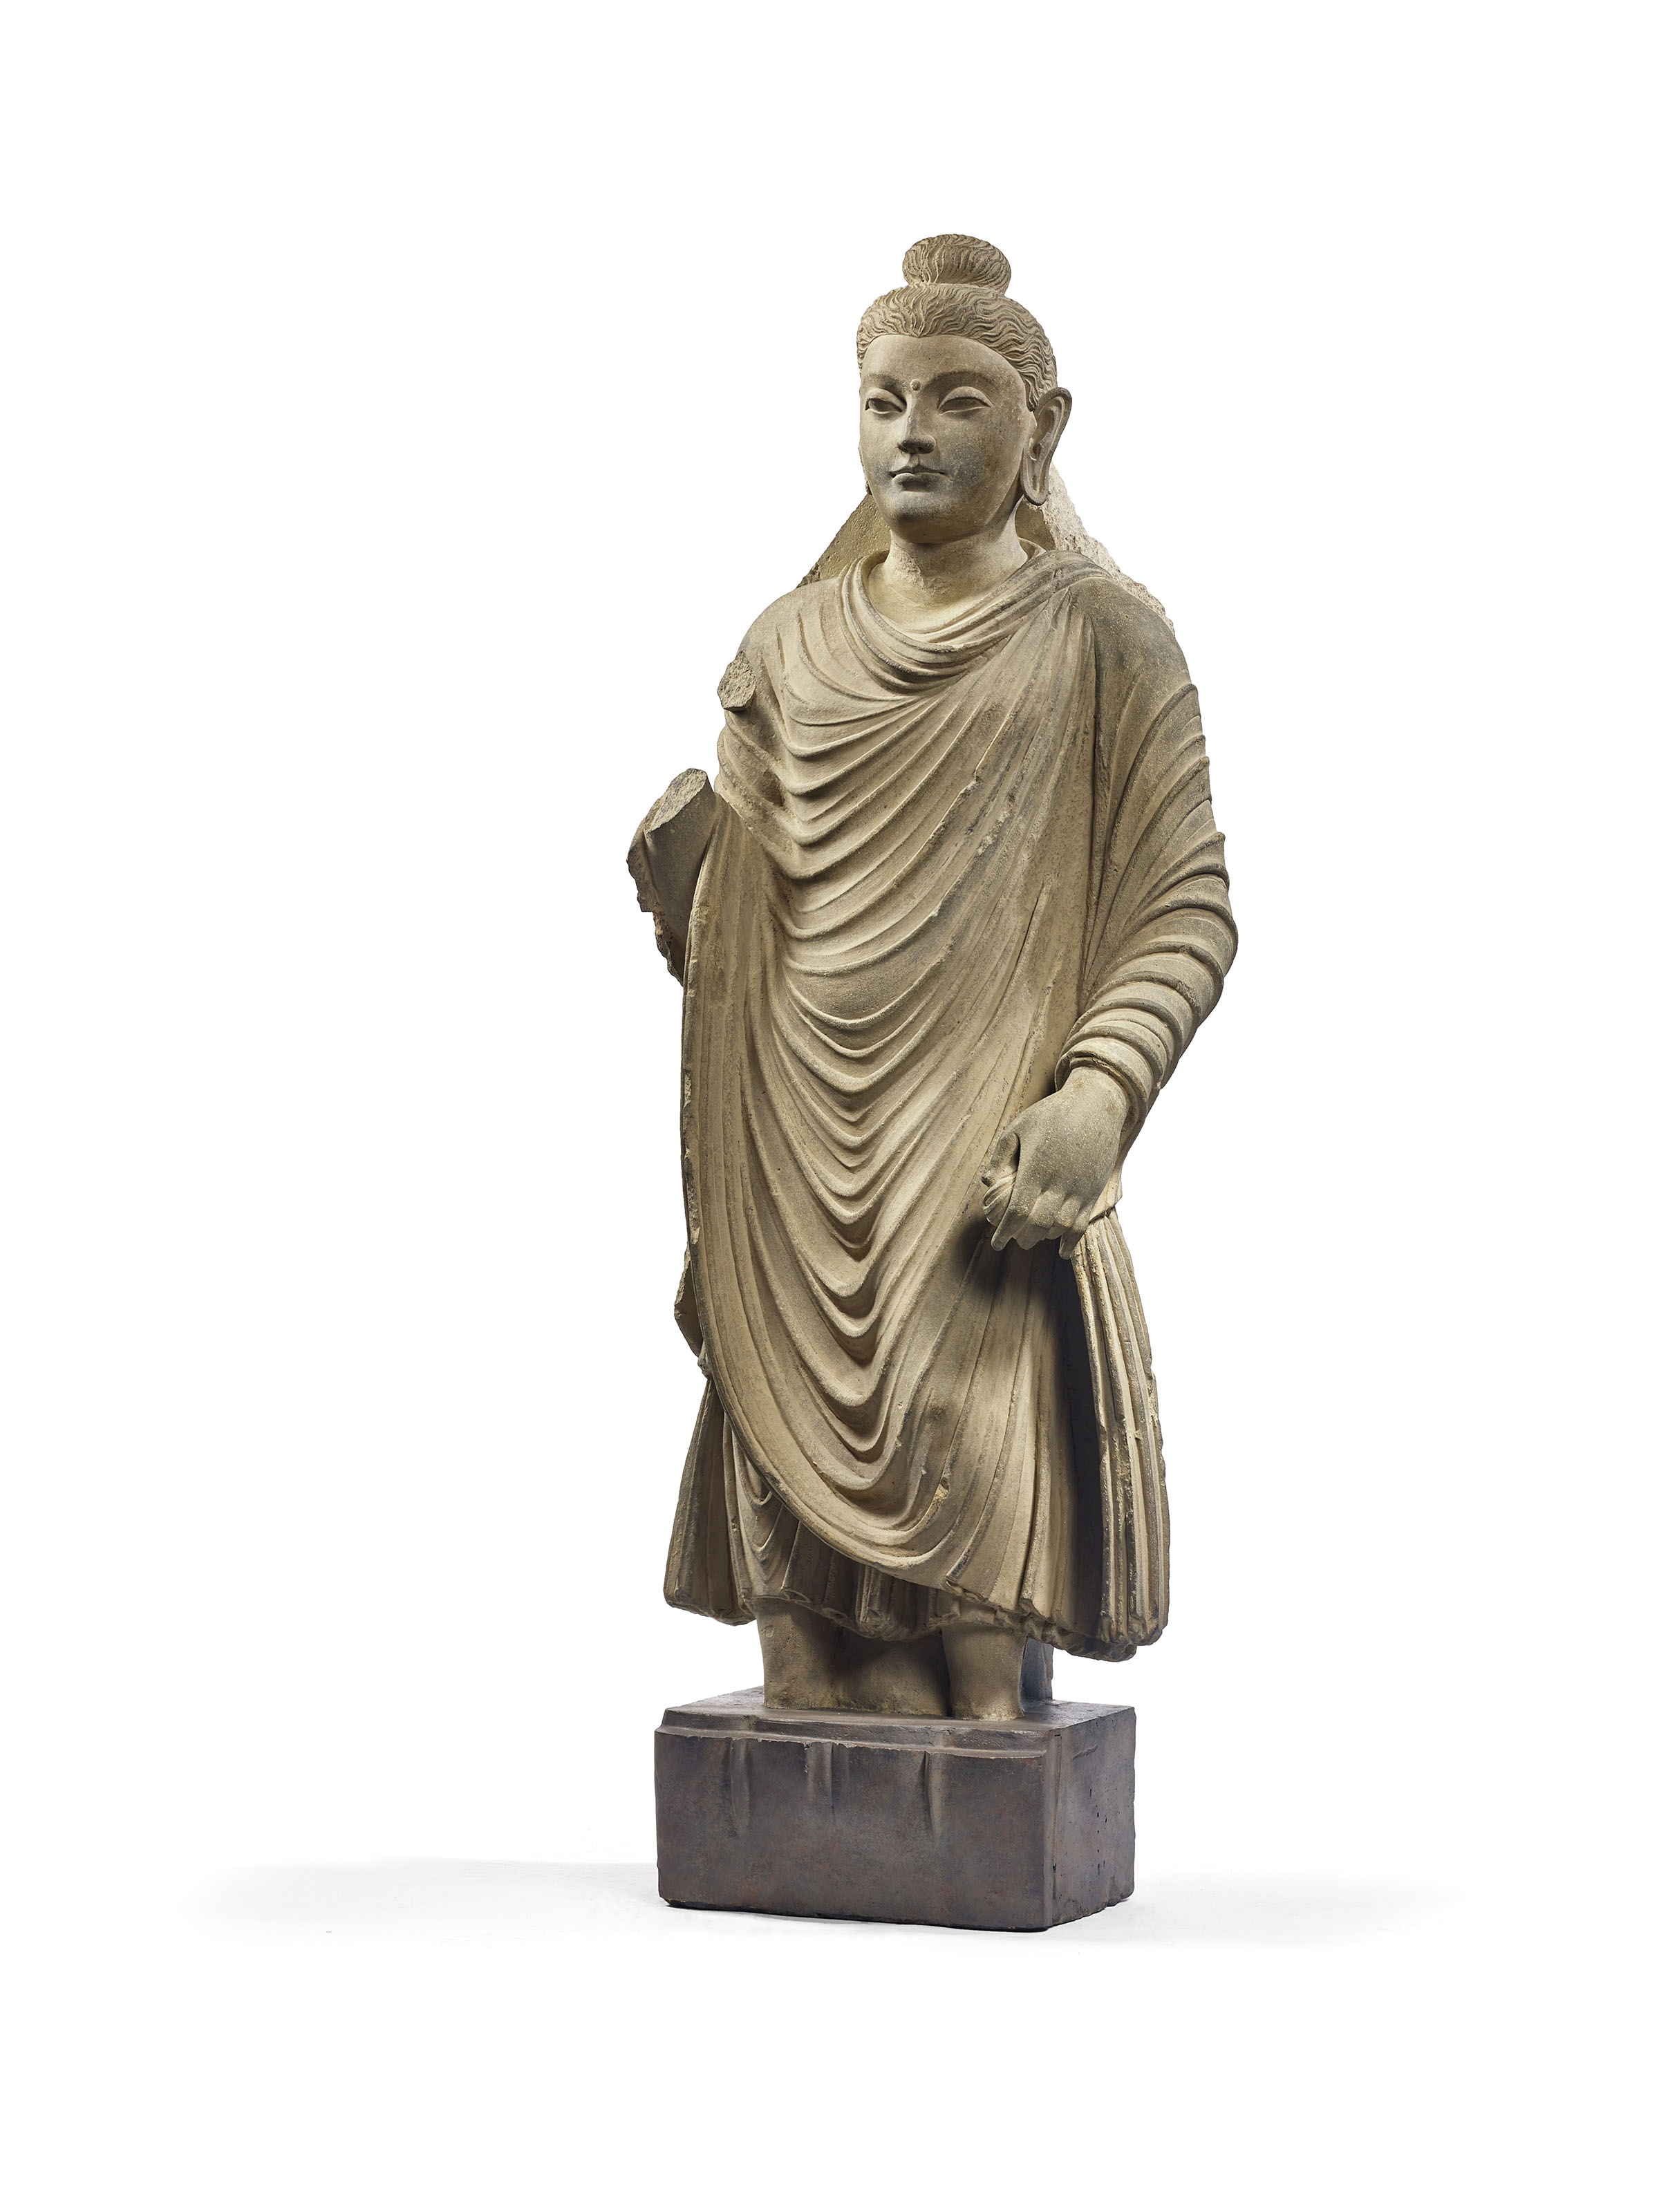 rare statue de bouddha en shakyamuni en schiste gris ancienne region du gandhara iieme iiieme. Black Bedroom Furniture Sets. Home Design Ideas